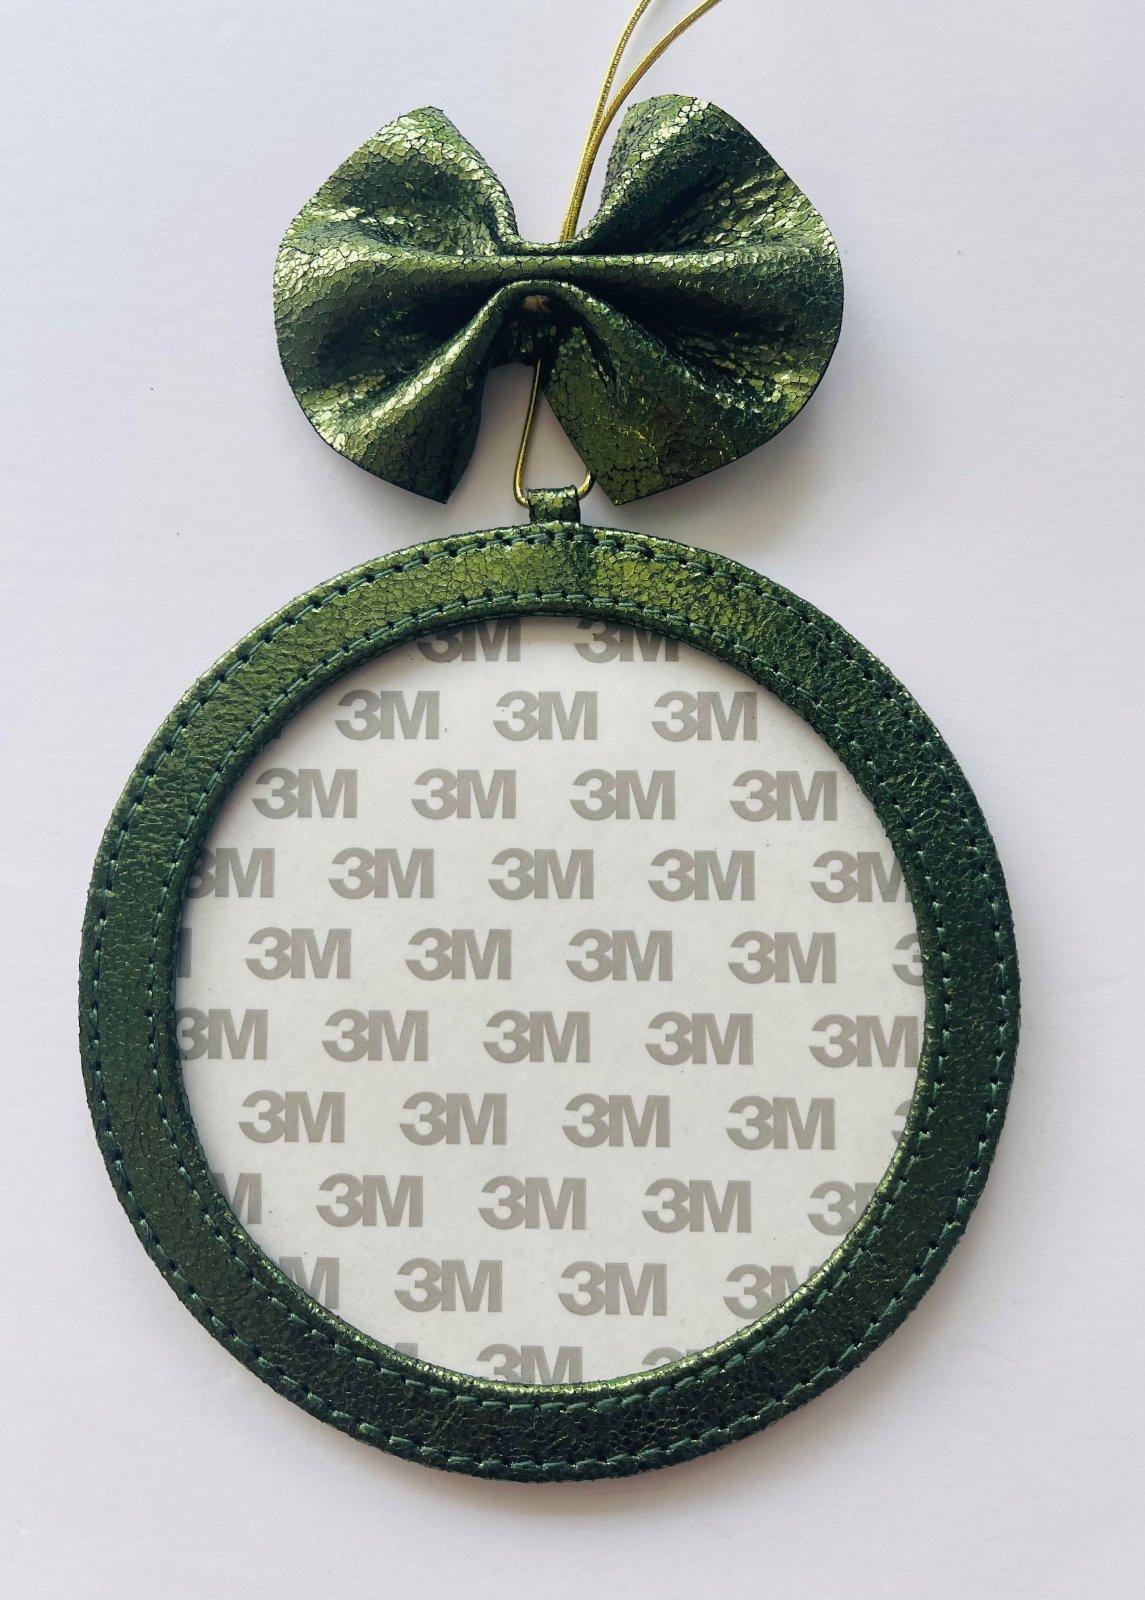 5 Round Holiday Ornament - Fern Foil